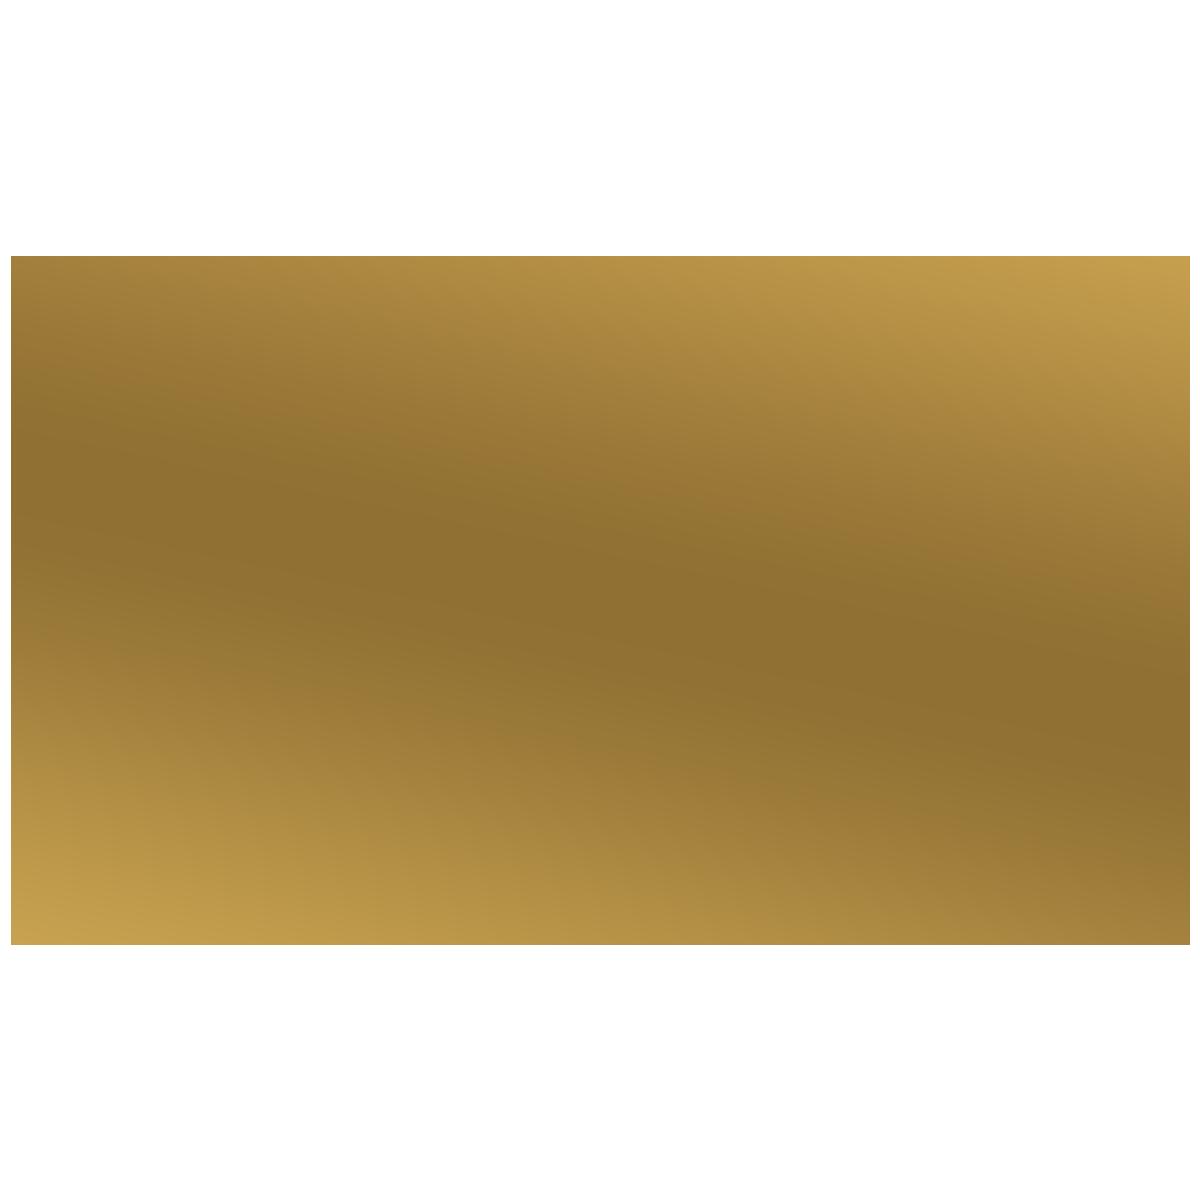 Taurus Men's Fabrics